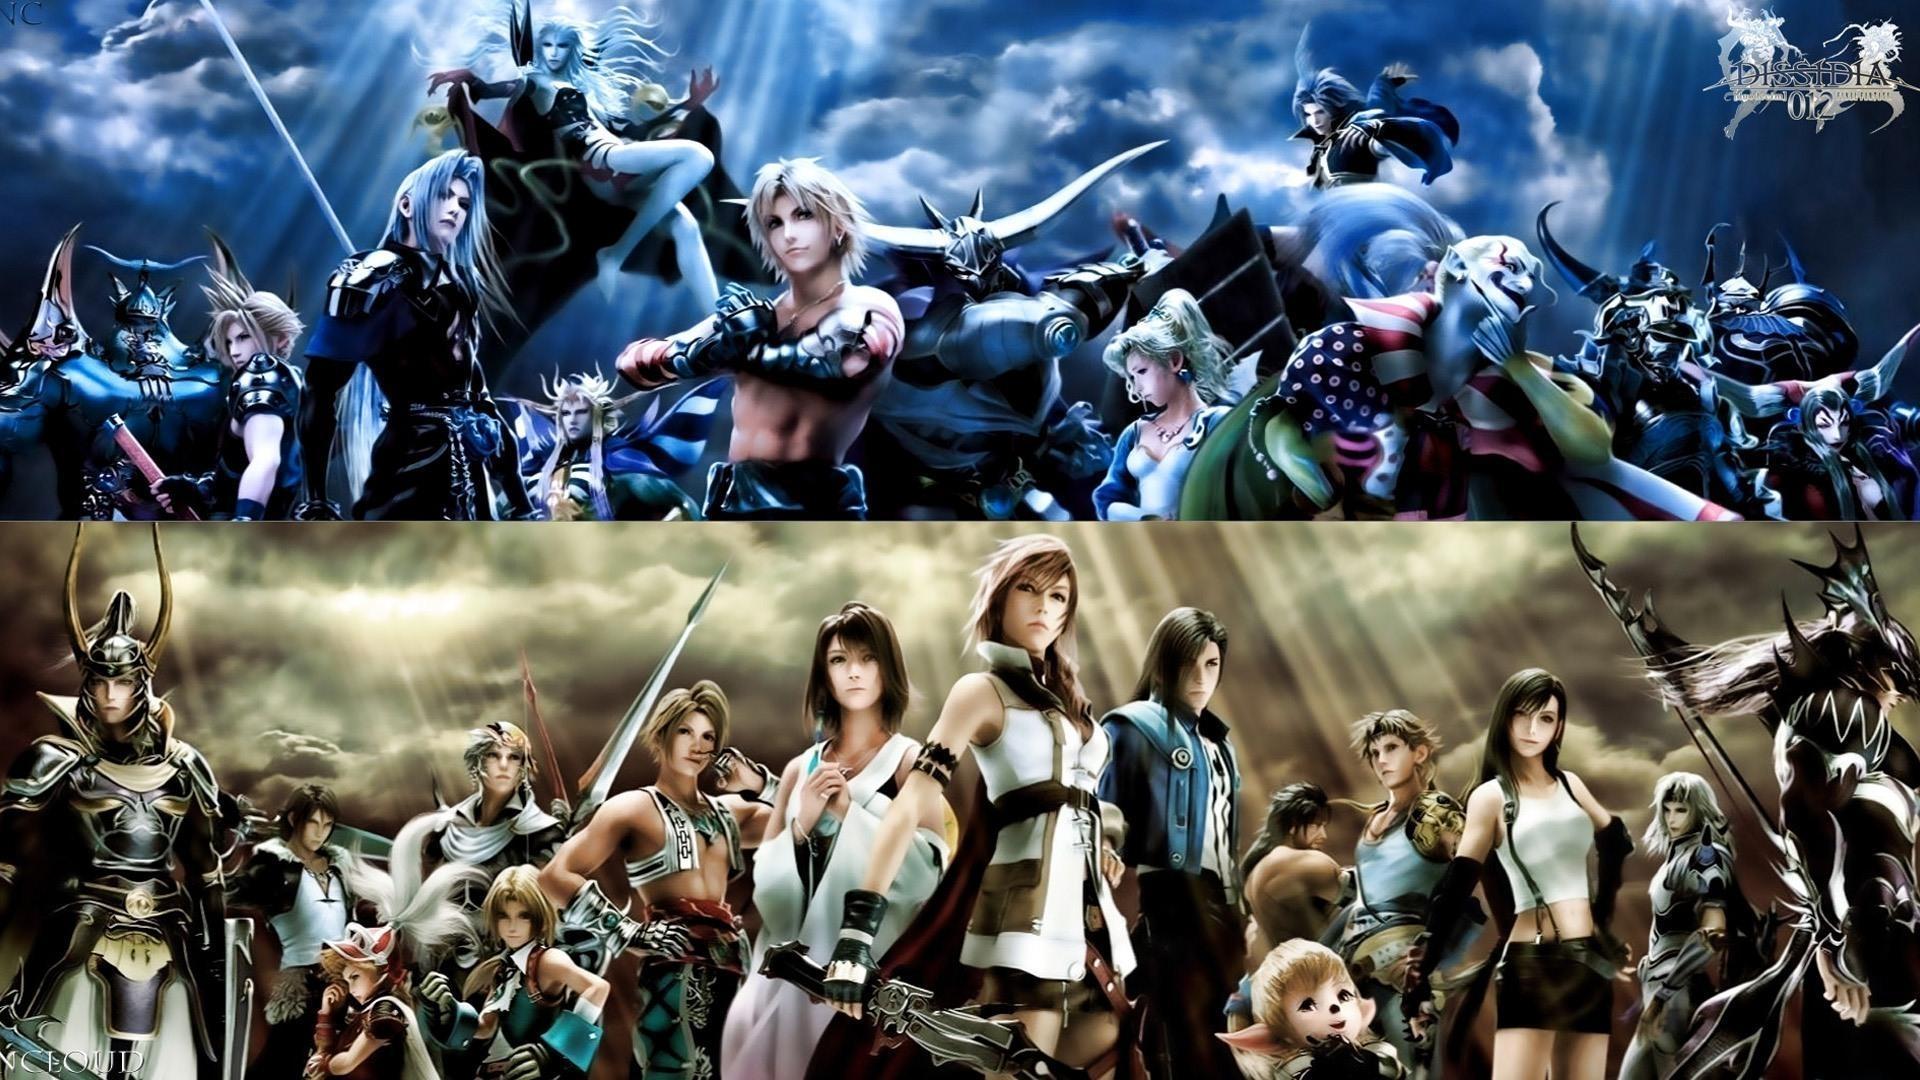 final fantasy dissidia hd desktop wallpaper : widescreen : high